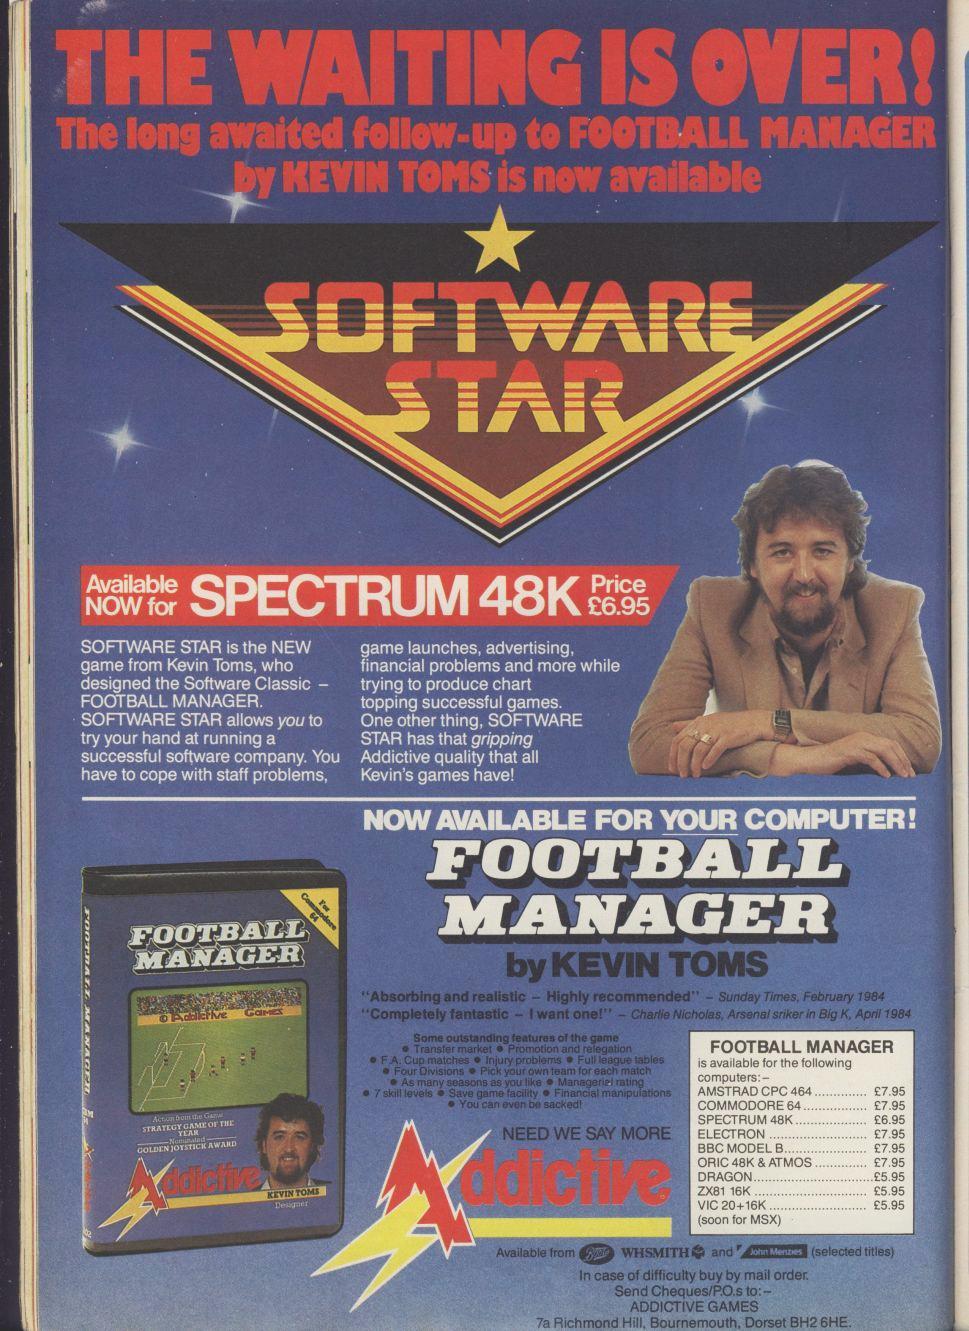 Football Manager Advert From The 1980s : VaporwaveAesthetics